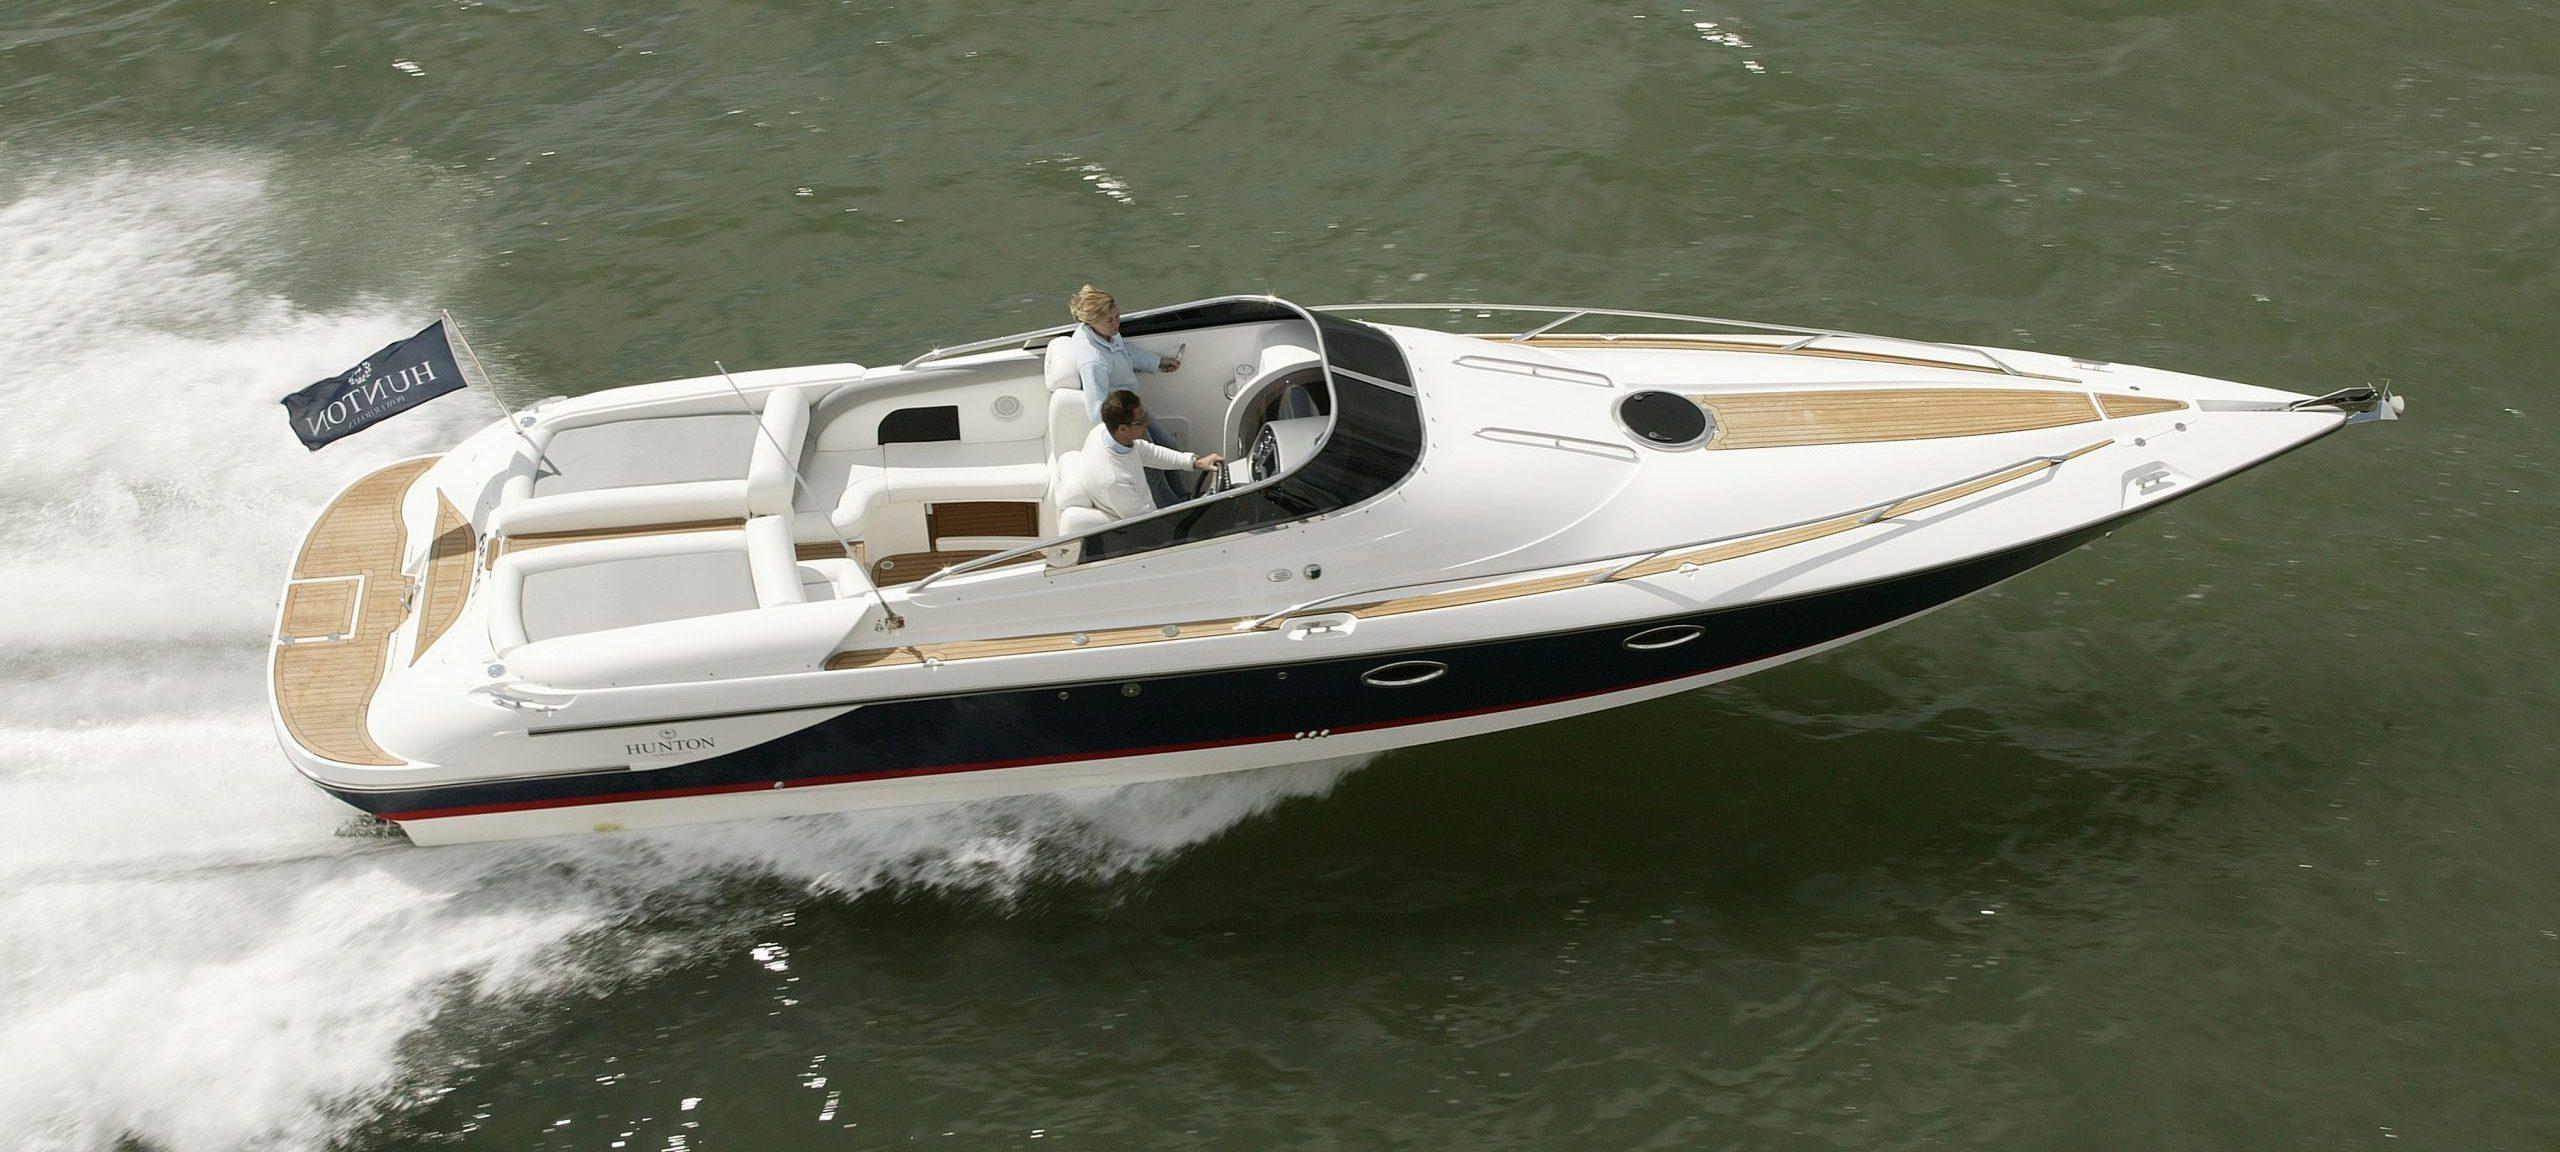 white hunton powerboat aerial view